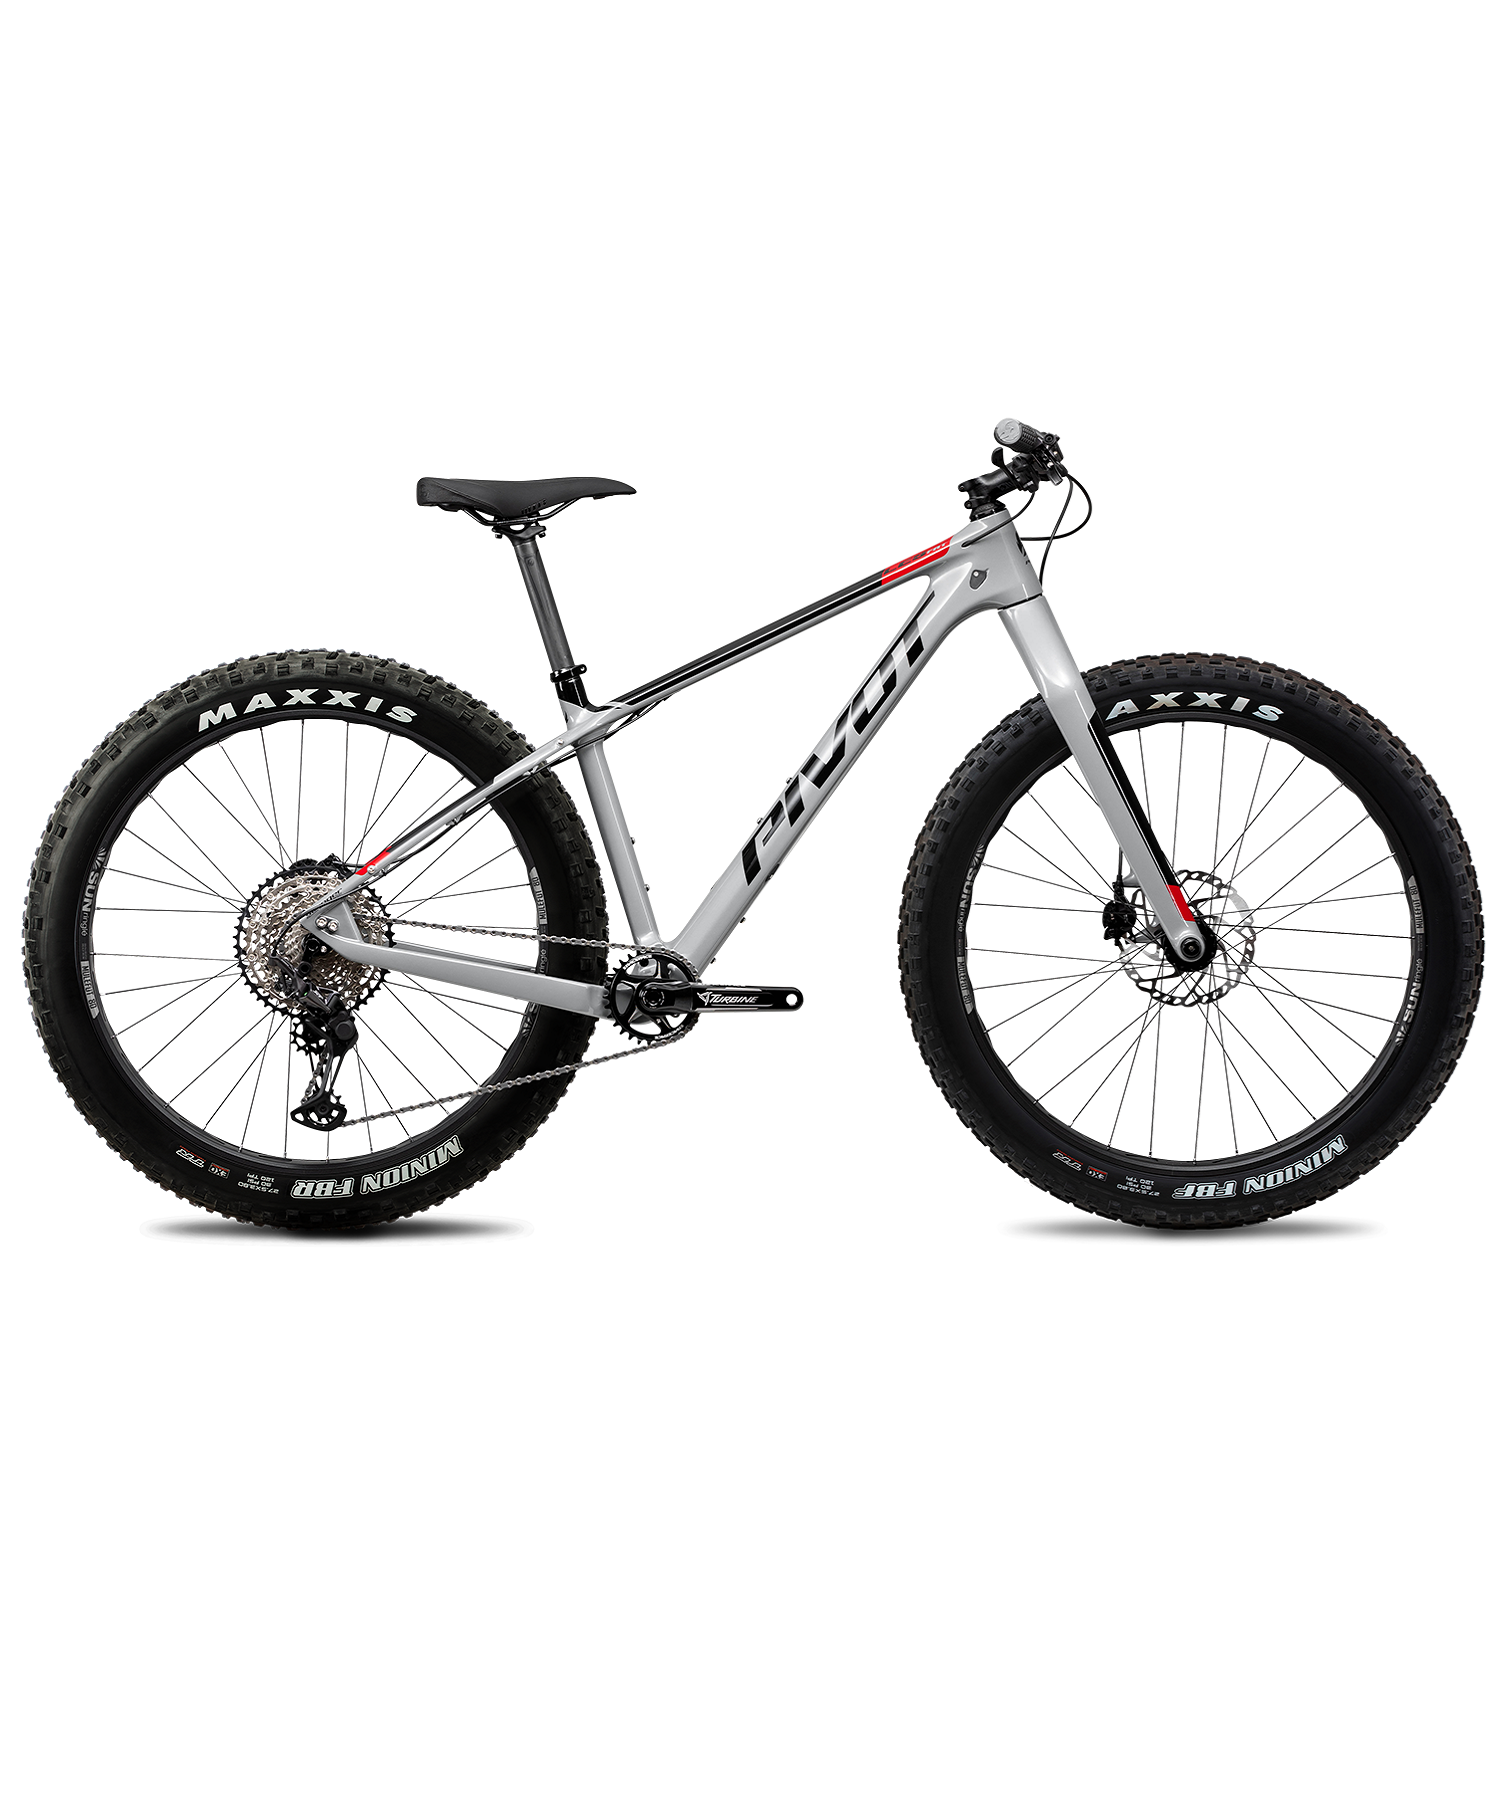 Pivot Cycles 2021 Pivot Les Fat V2 Pro Xt XC Race Cement L